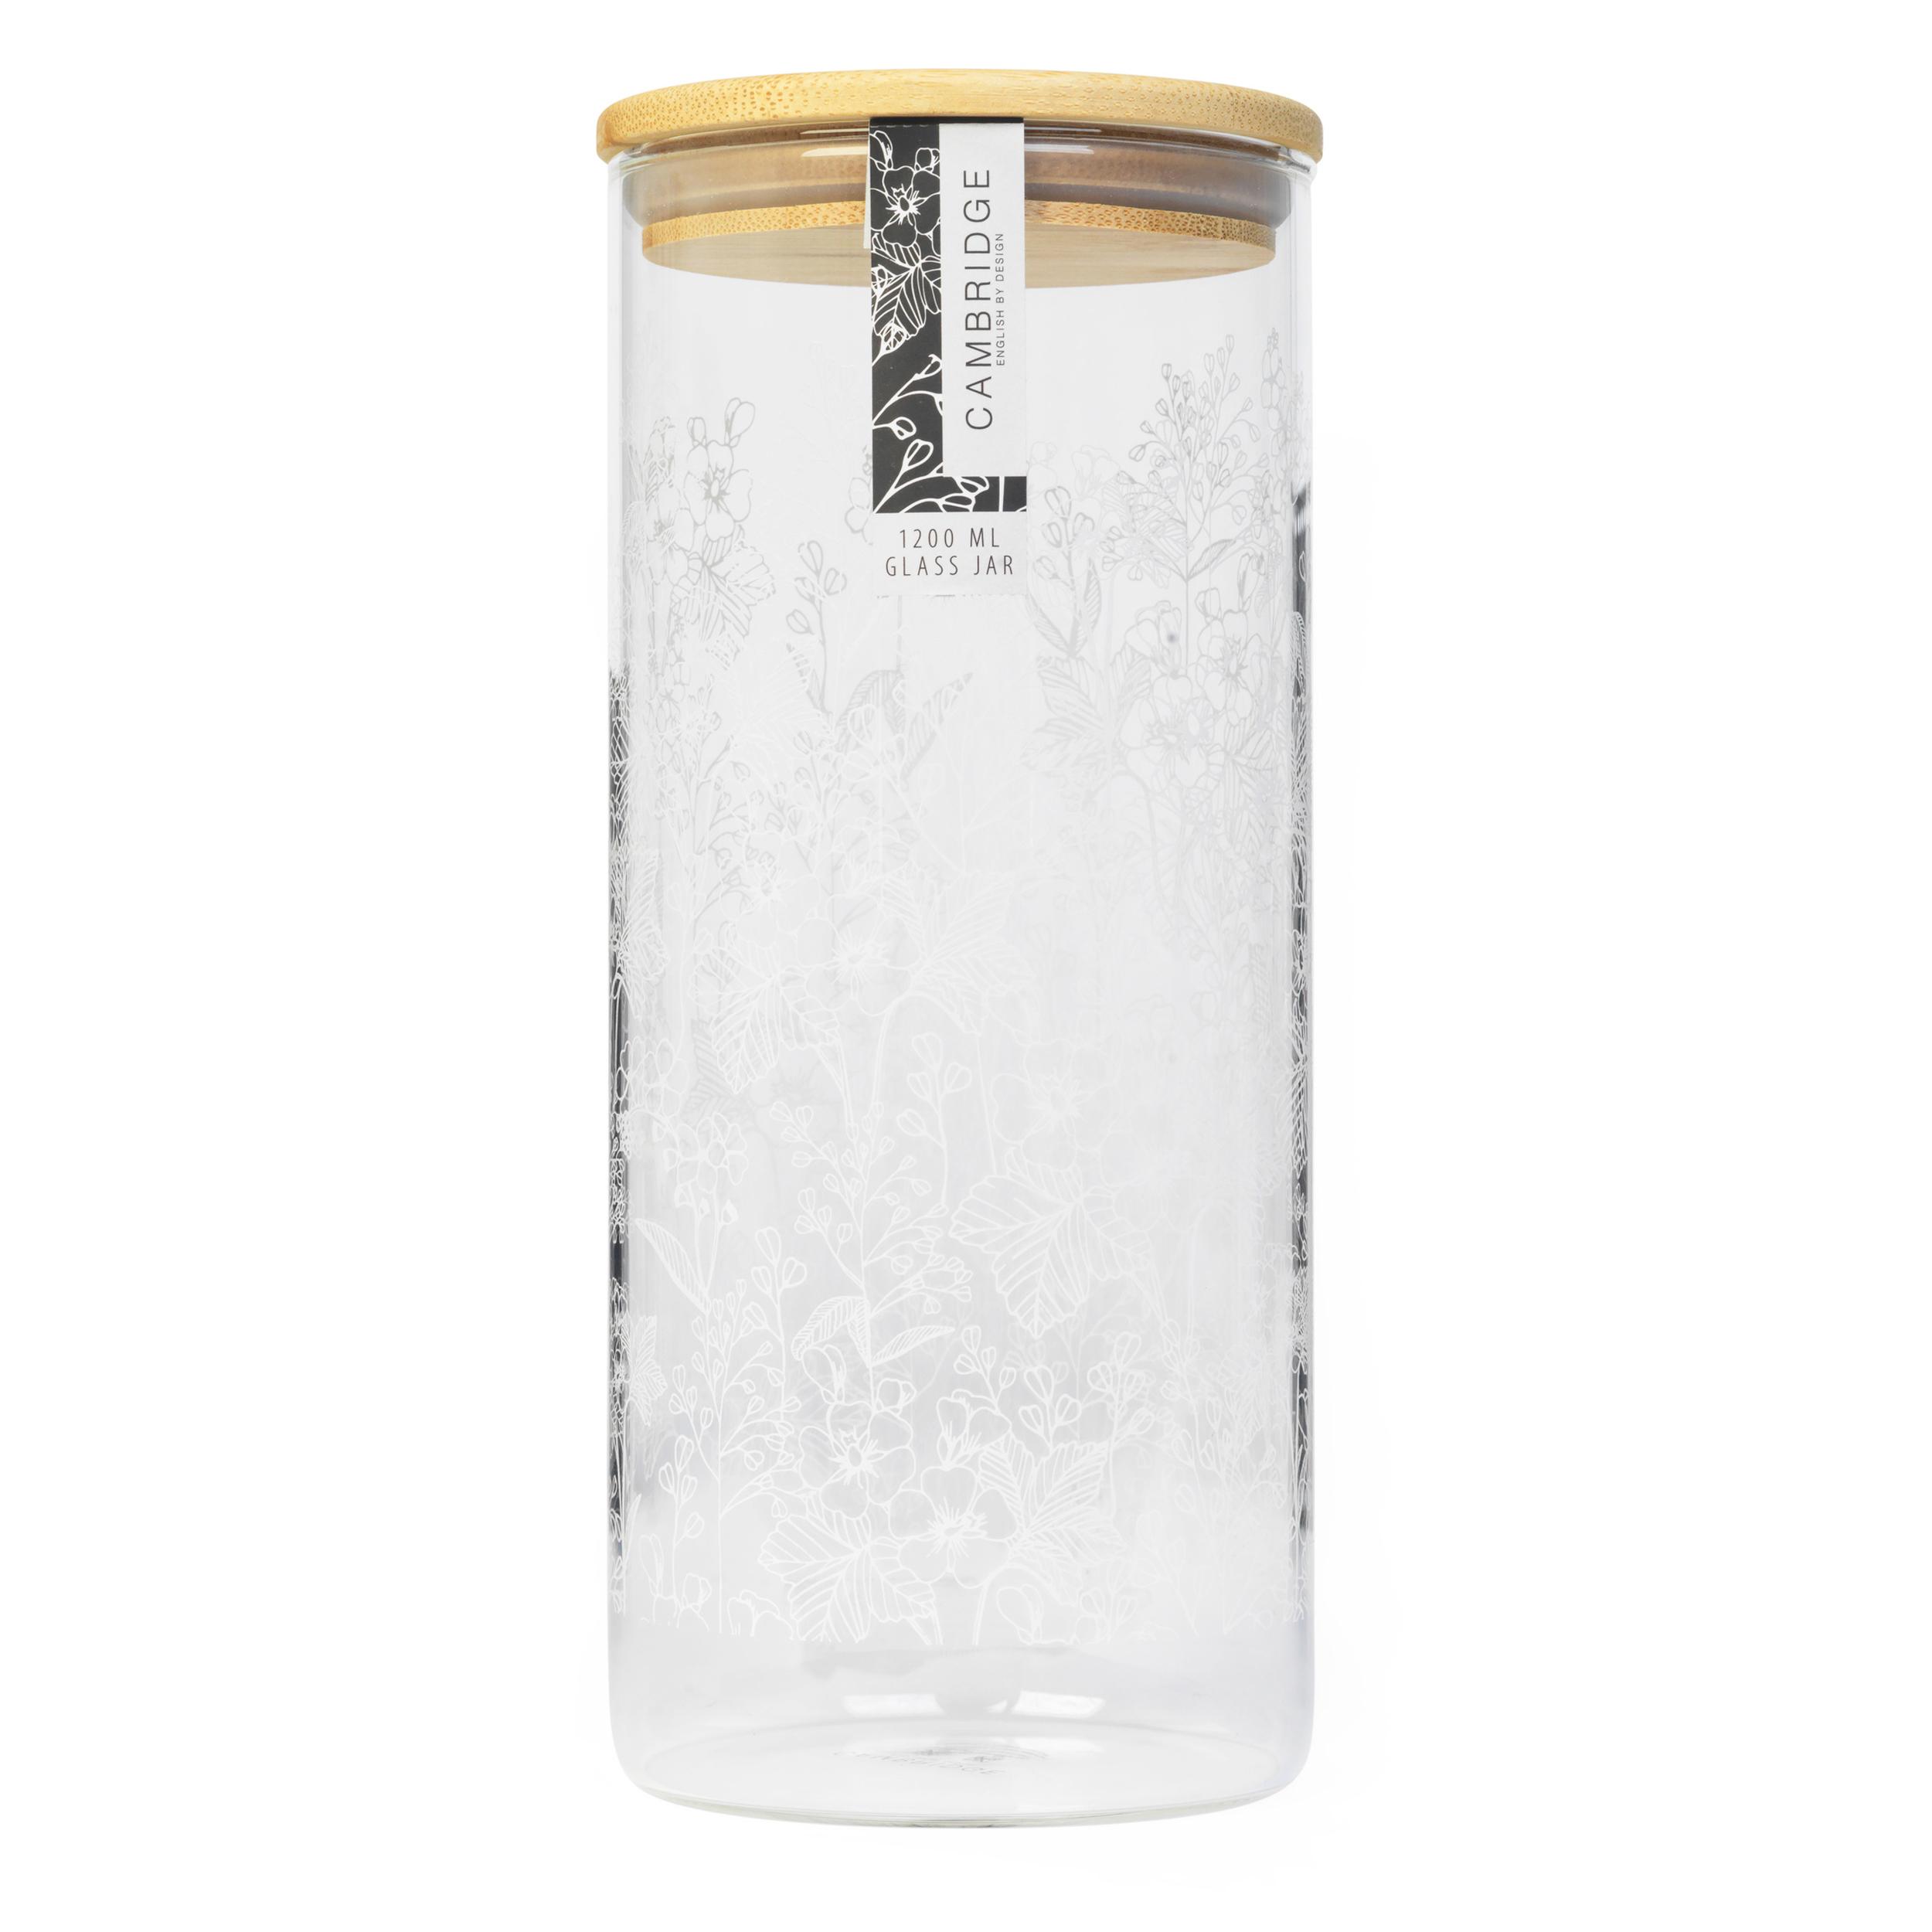 thumbnail 16 - Cambridge® Storage Preserving Glass Jar, 1200 ml, Spring Meadow/Doodle/Arielle